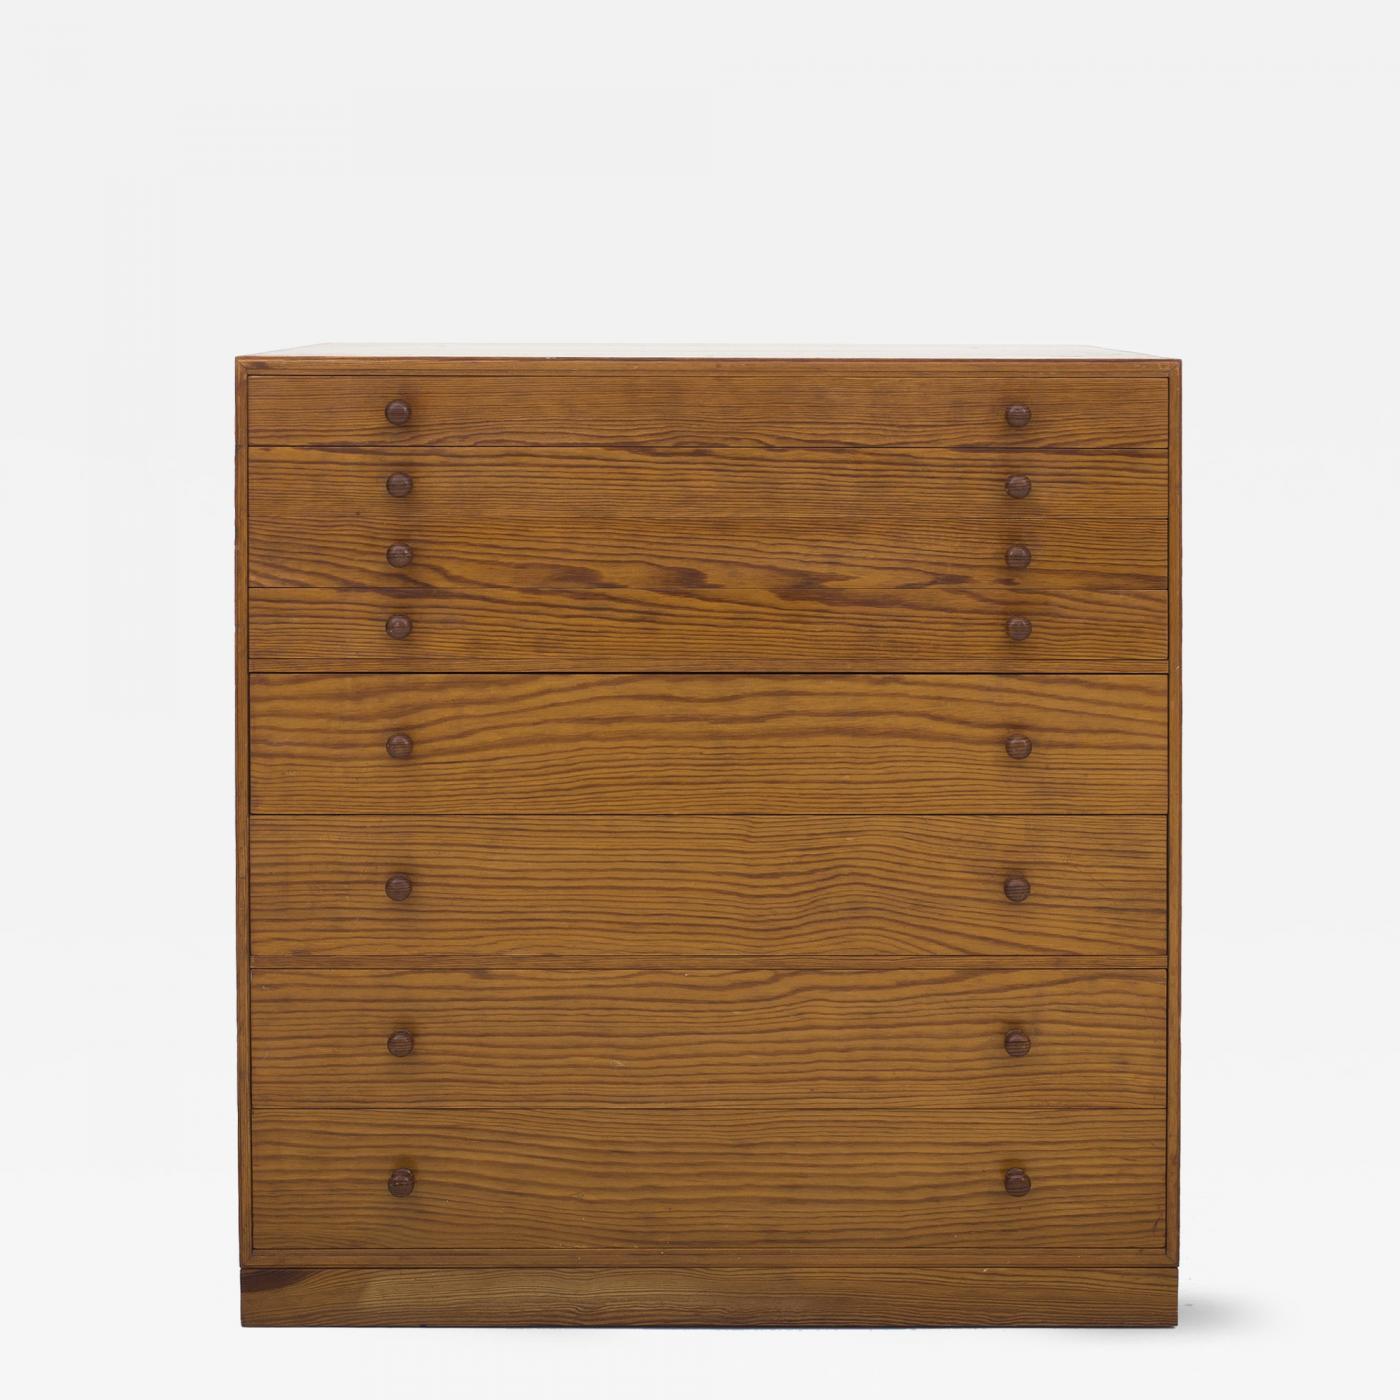 Listings / Furniture / Case Pieces U0026 Storage / Cabinets